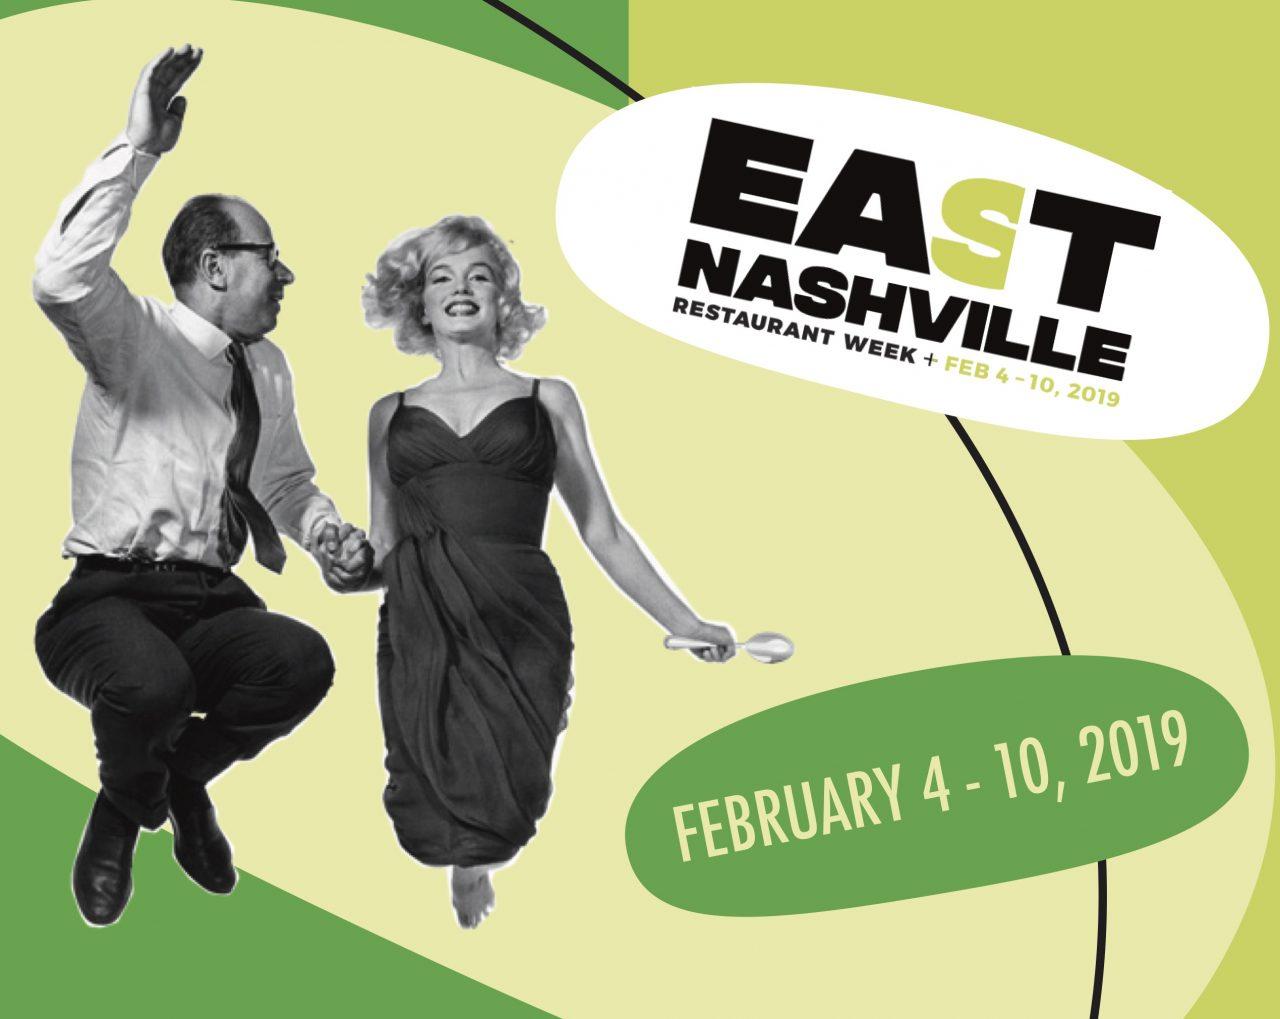 It's East Nashville Restaurant Week!